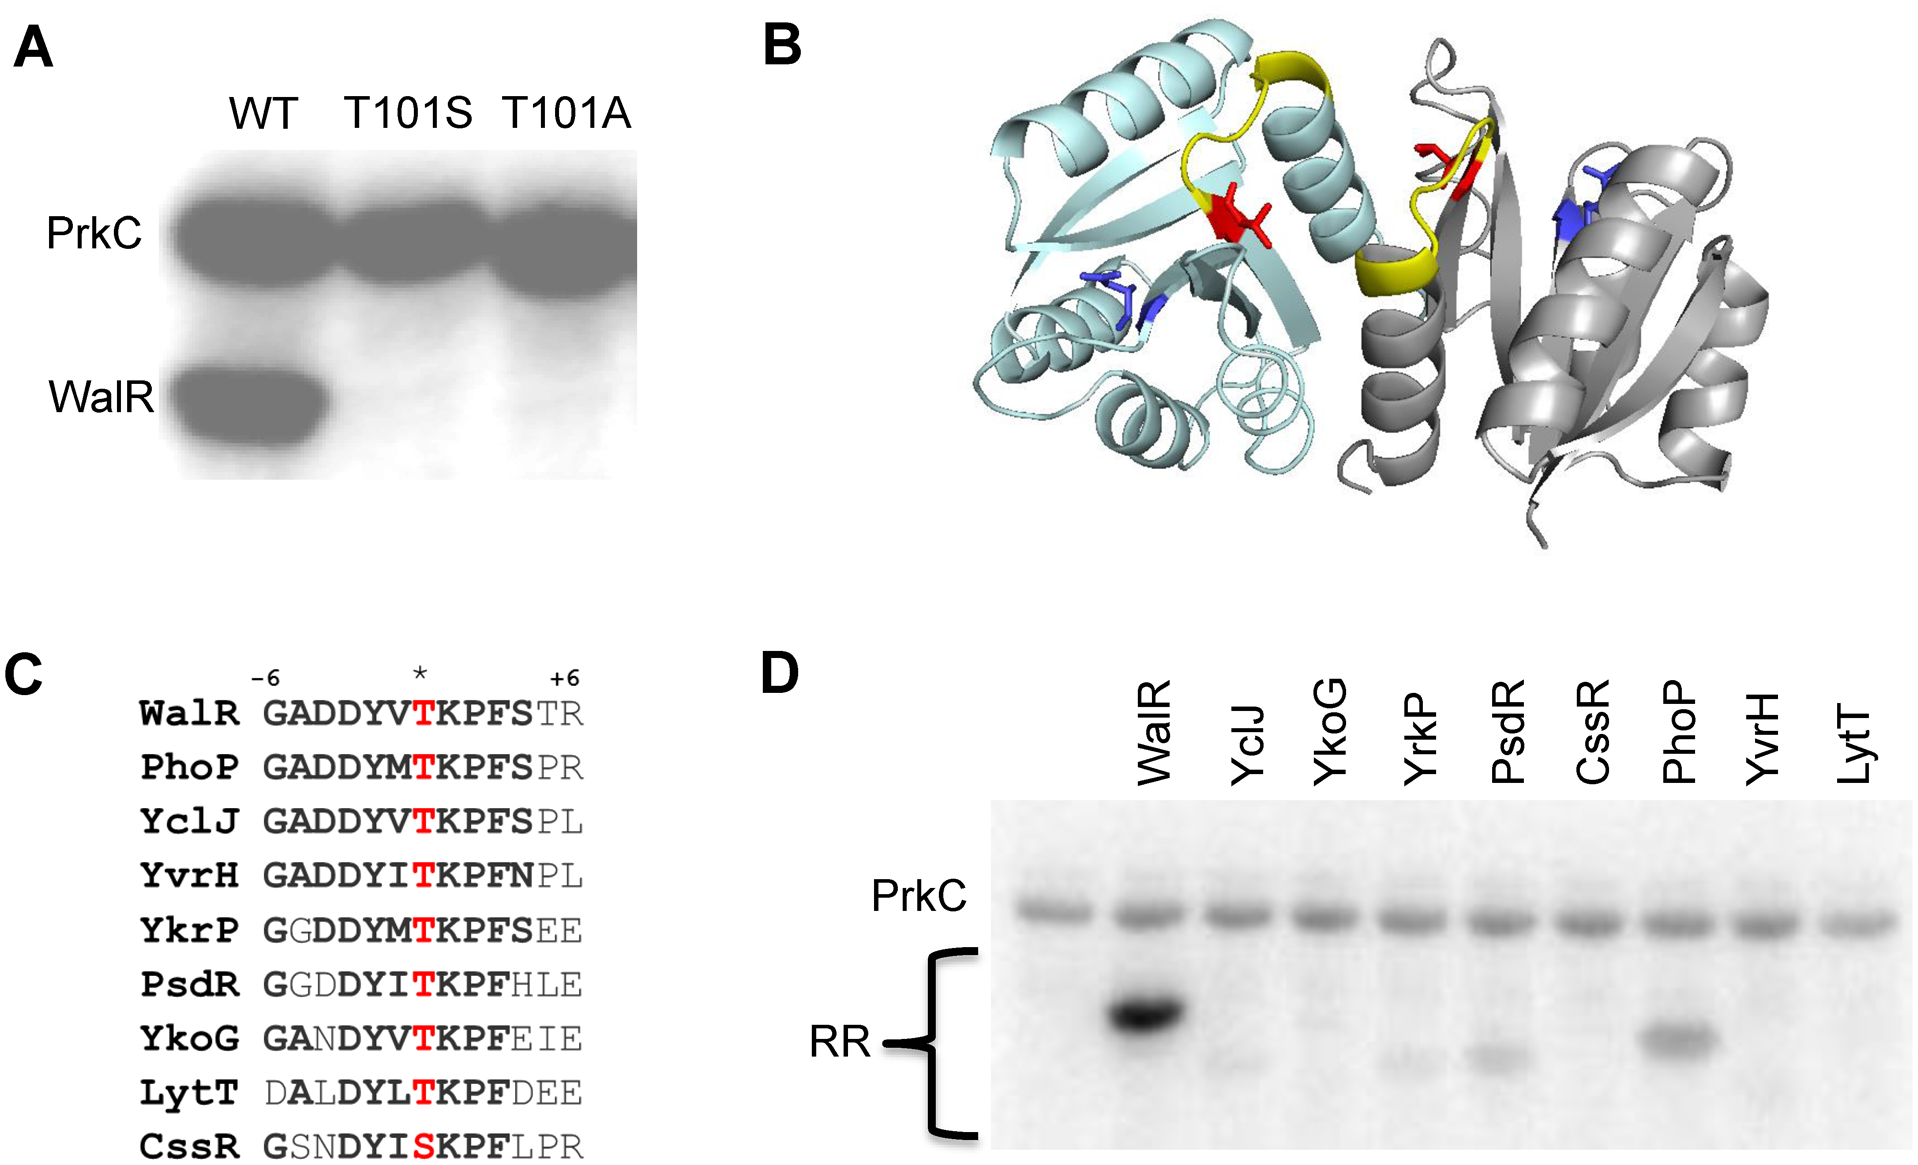 PrkC phosphorylates WalR Thr101 <i>in vitro</i>.